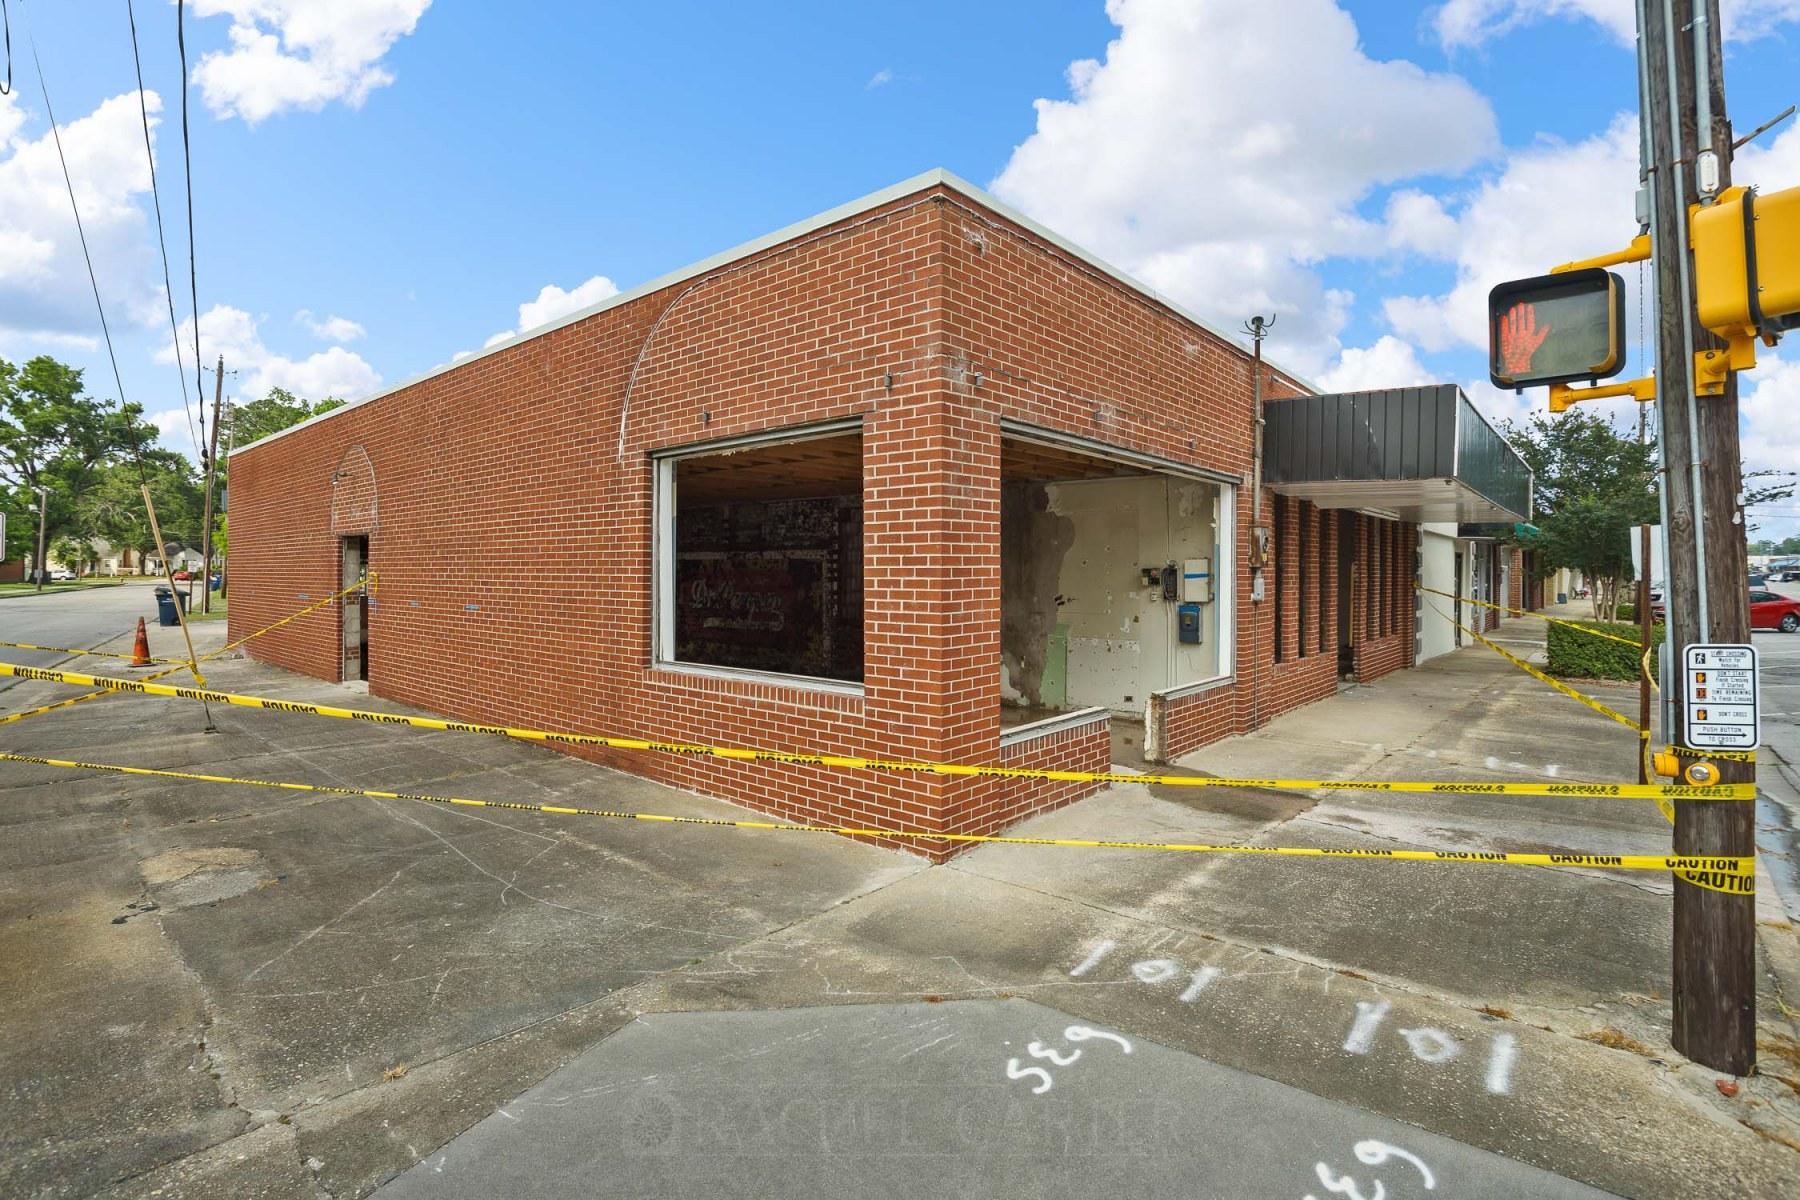 Horizons-East-Office-Renovation-1st-Set-27May2021_SB_01306_web-size